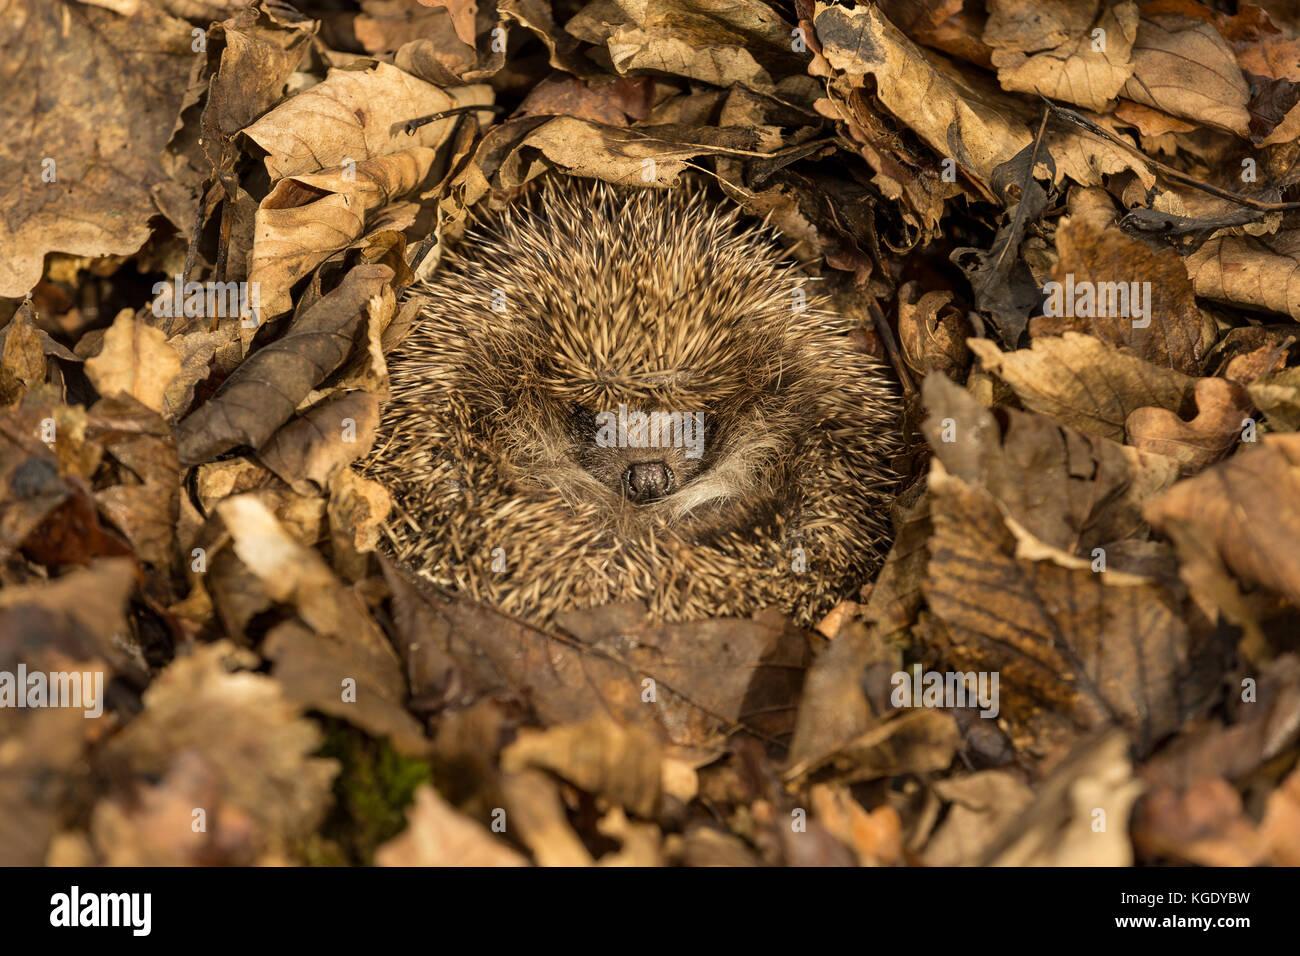 Winterschlaf Igel Stockfotos Winterschlaf Igel Bilder Alamy